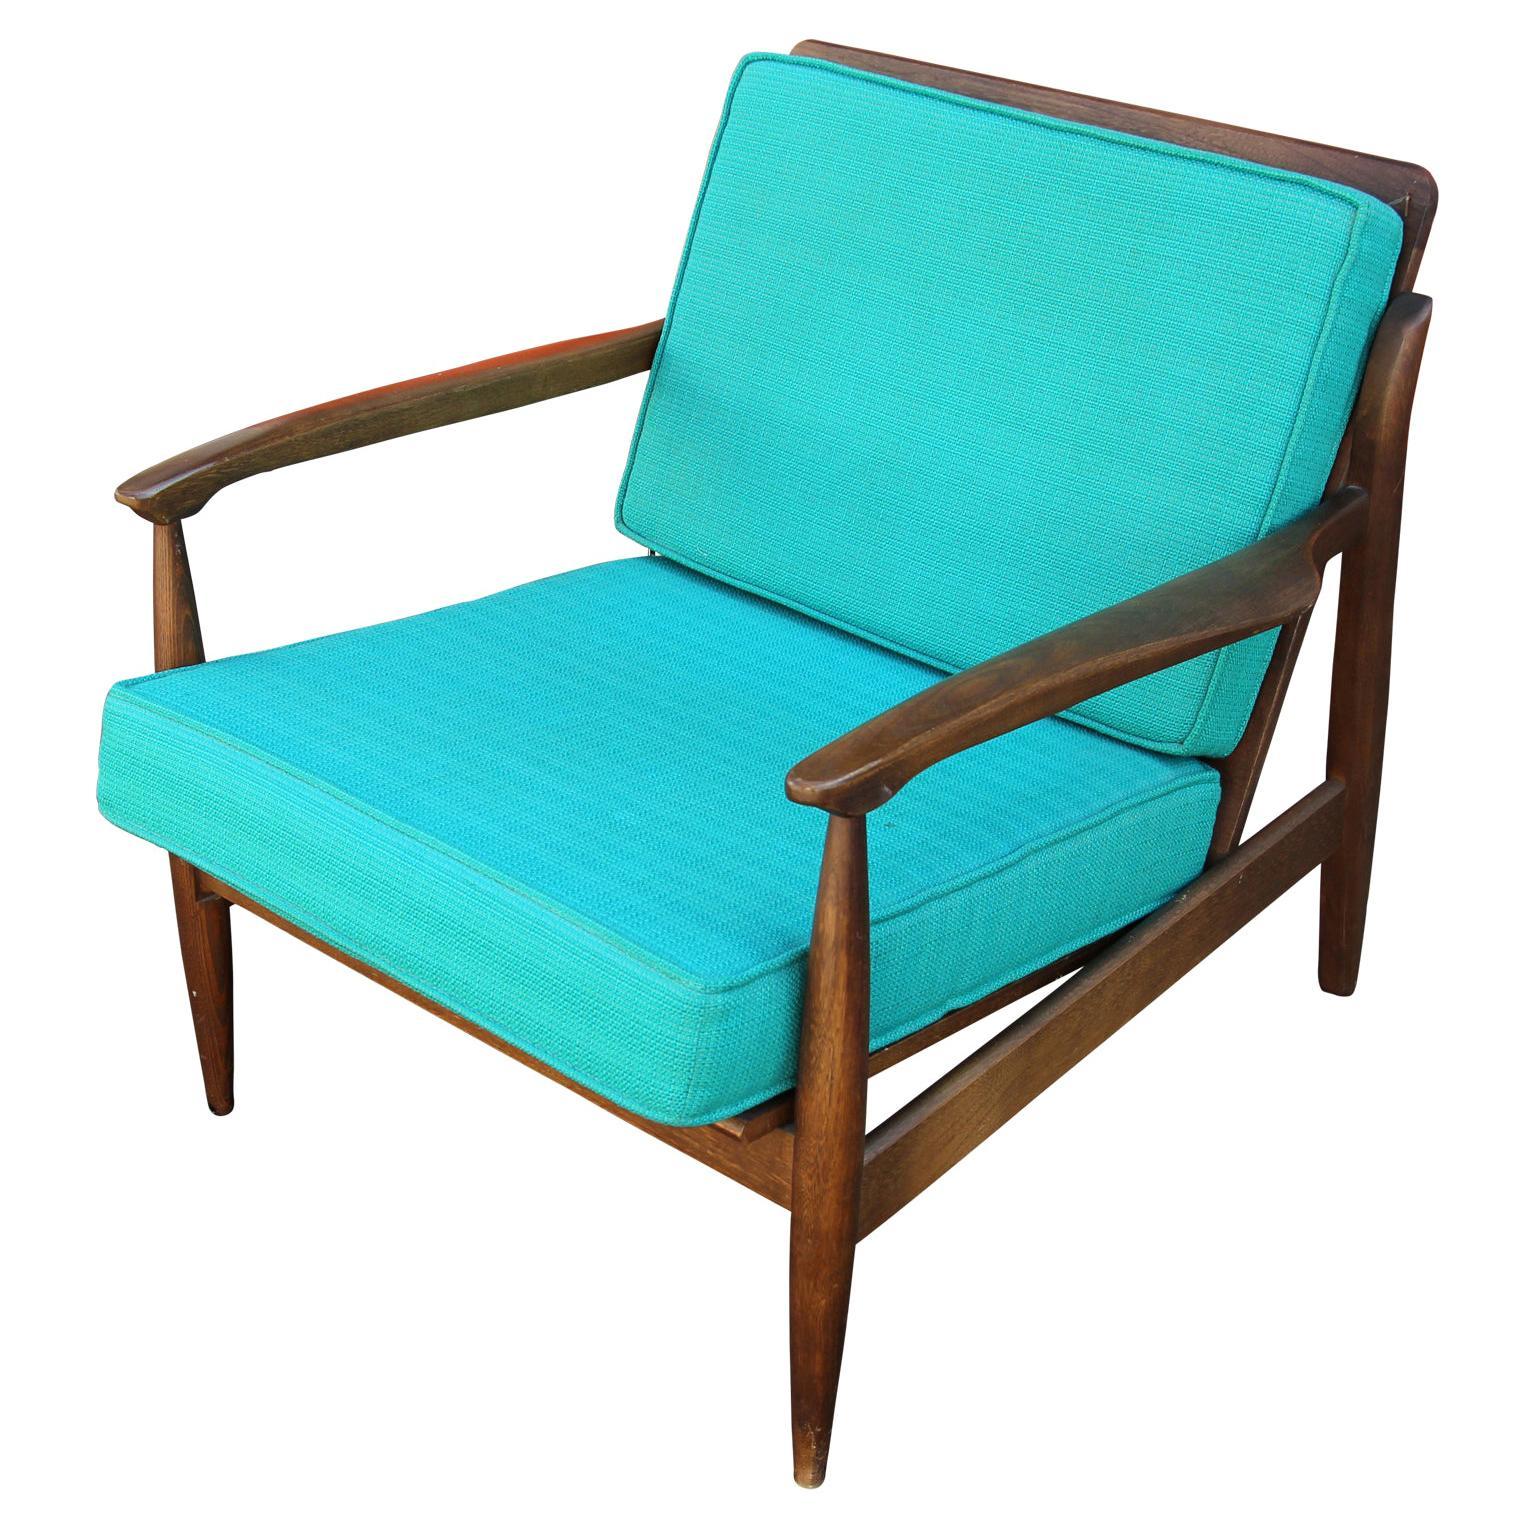 Modern Danish Style Blue Cushioned Teak Lounge Chair